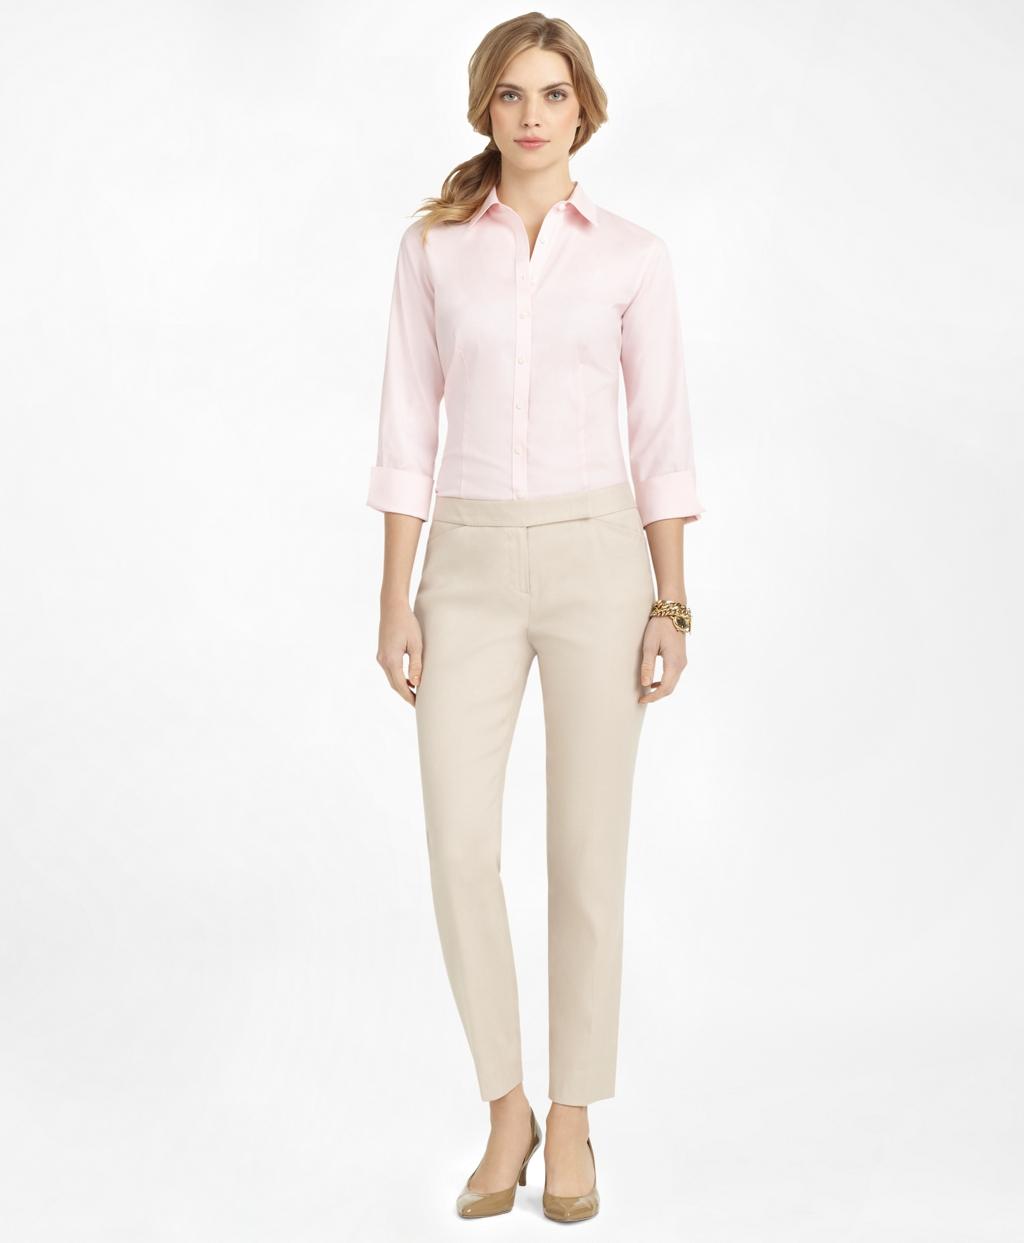 Womens Non Iron Fitted Three Quarter Sleeve Dress Shirt Brooks